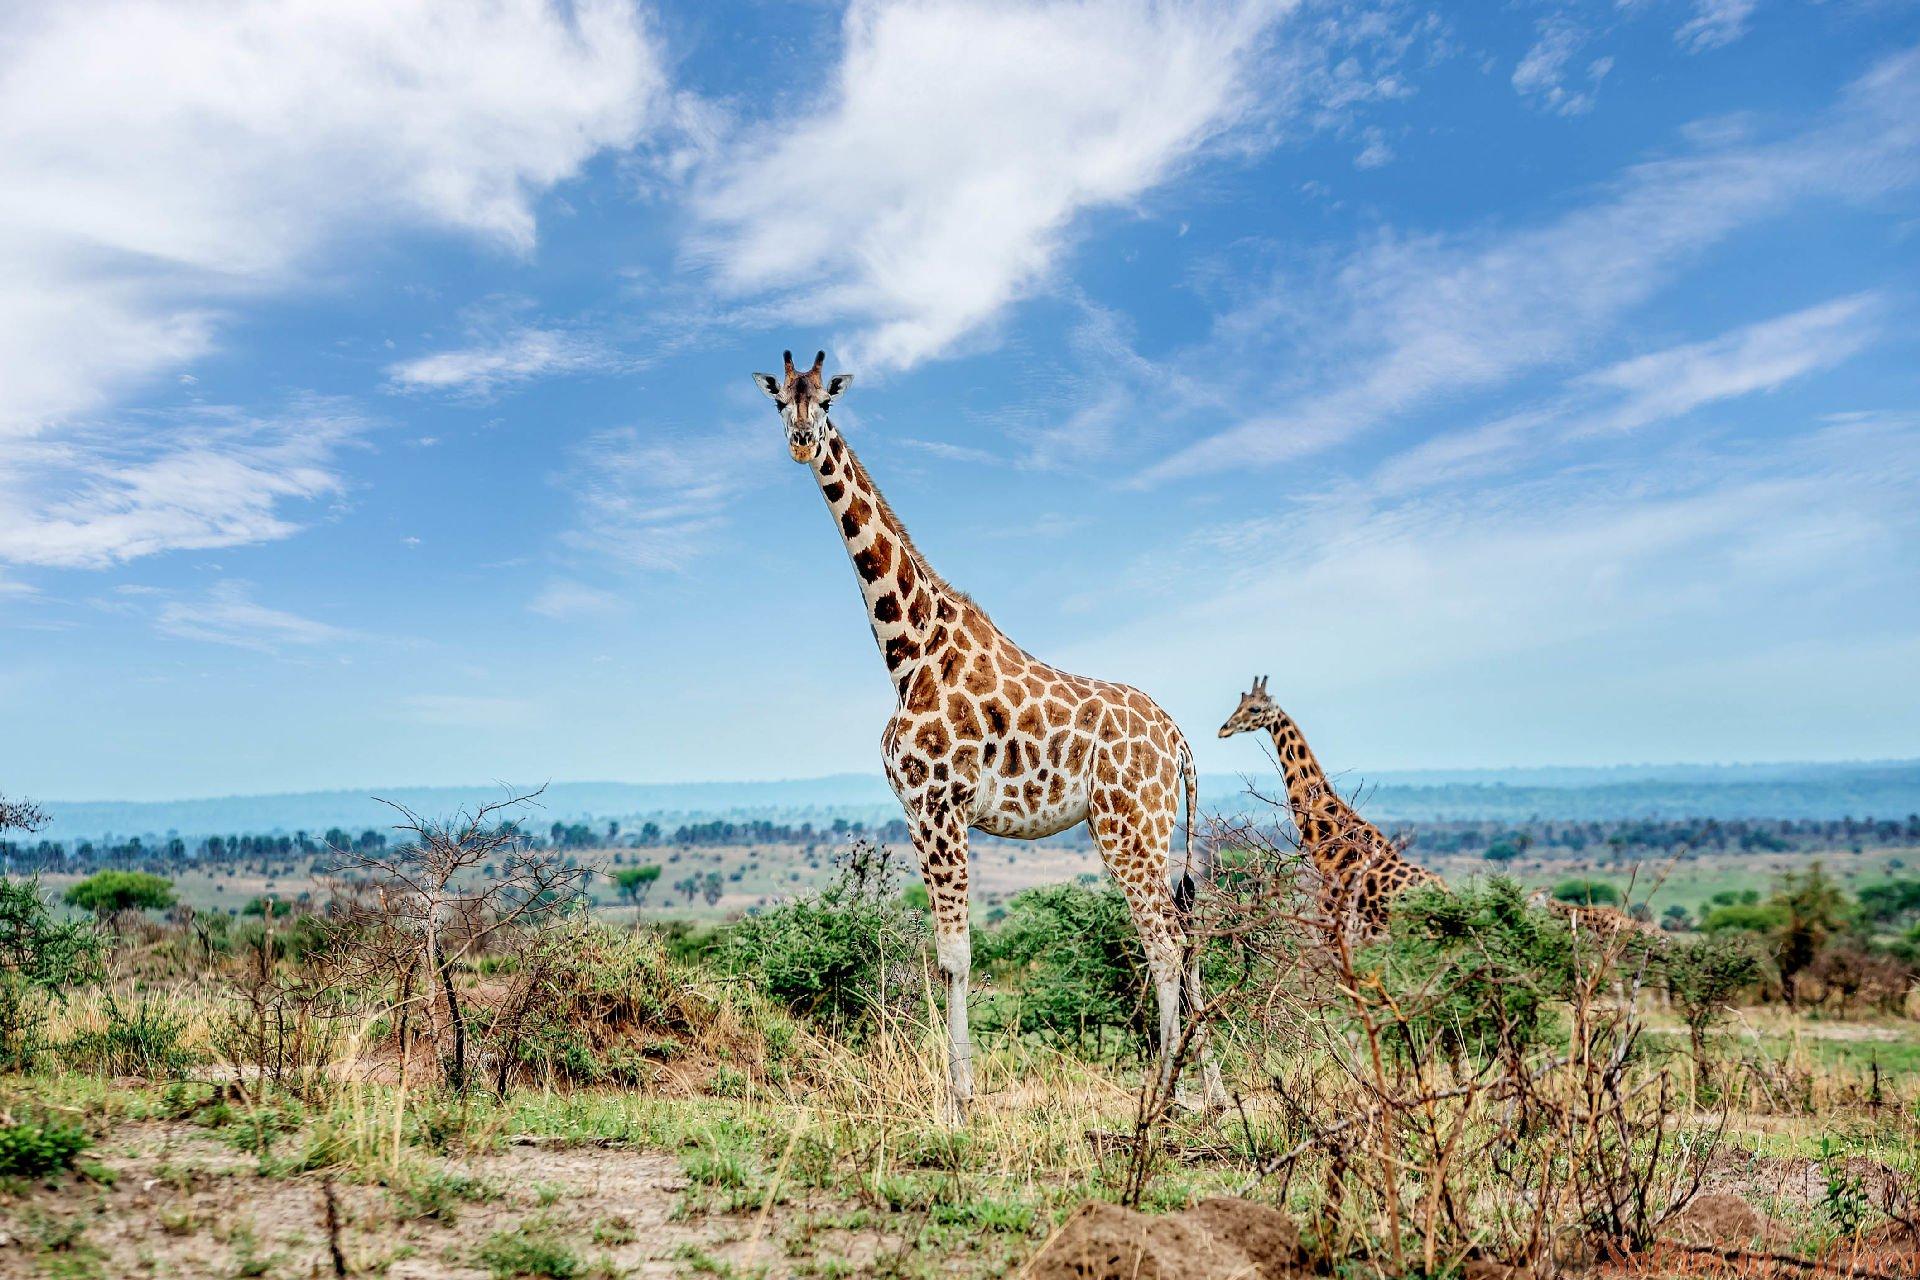 Giraffe in Murchison falls National Park, Uganda